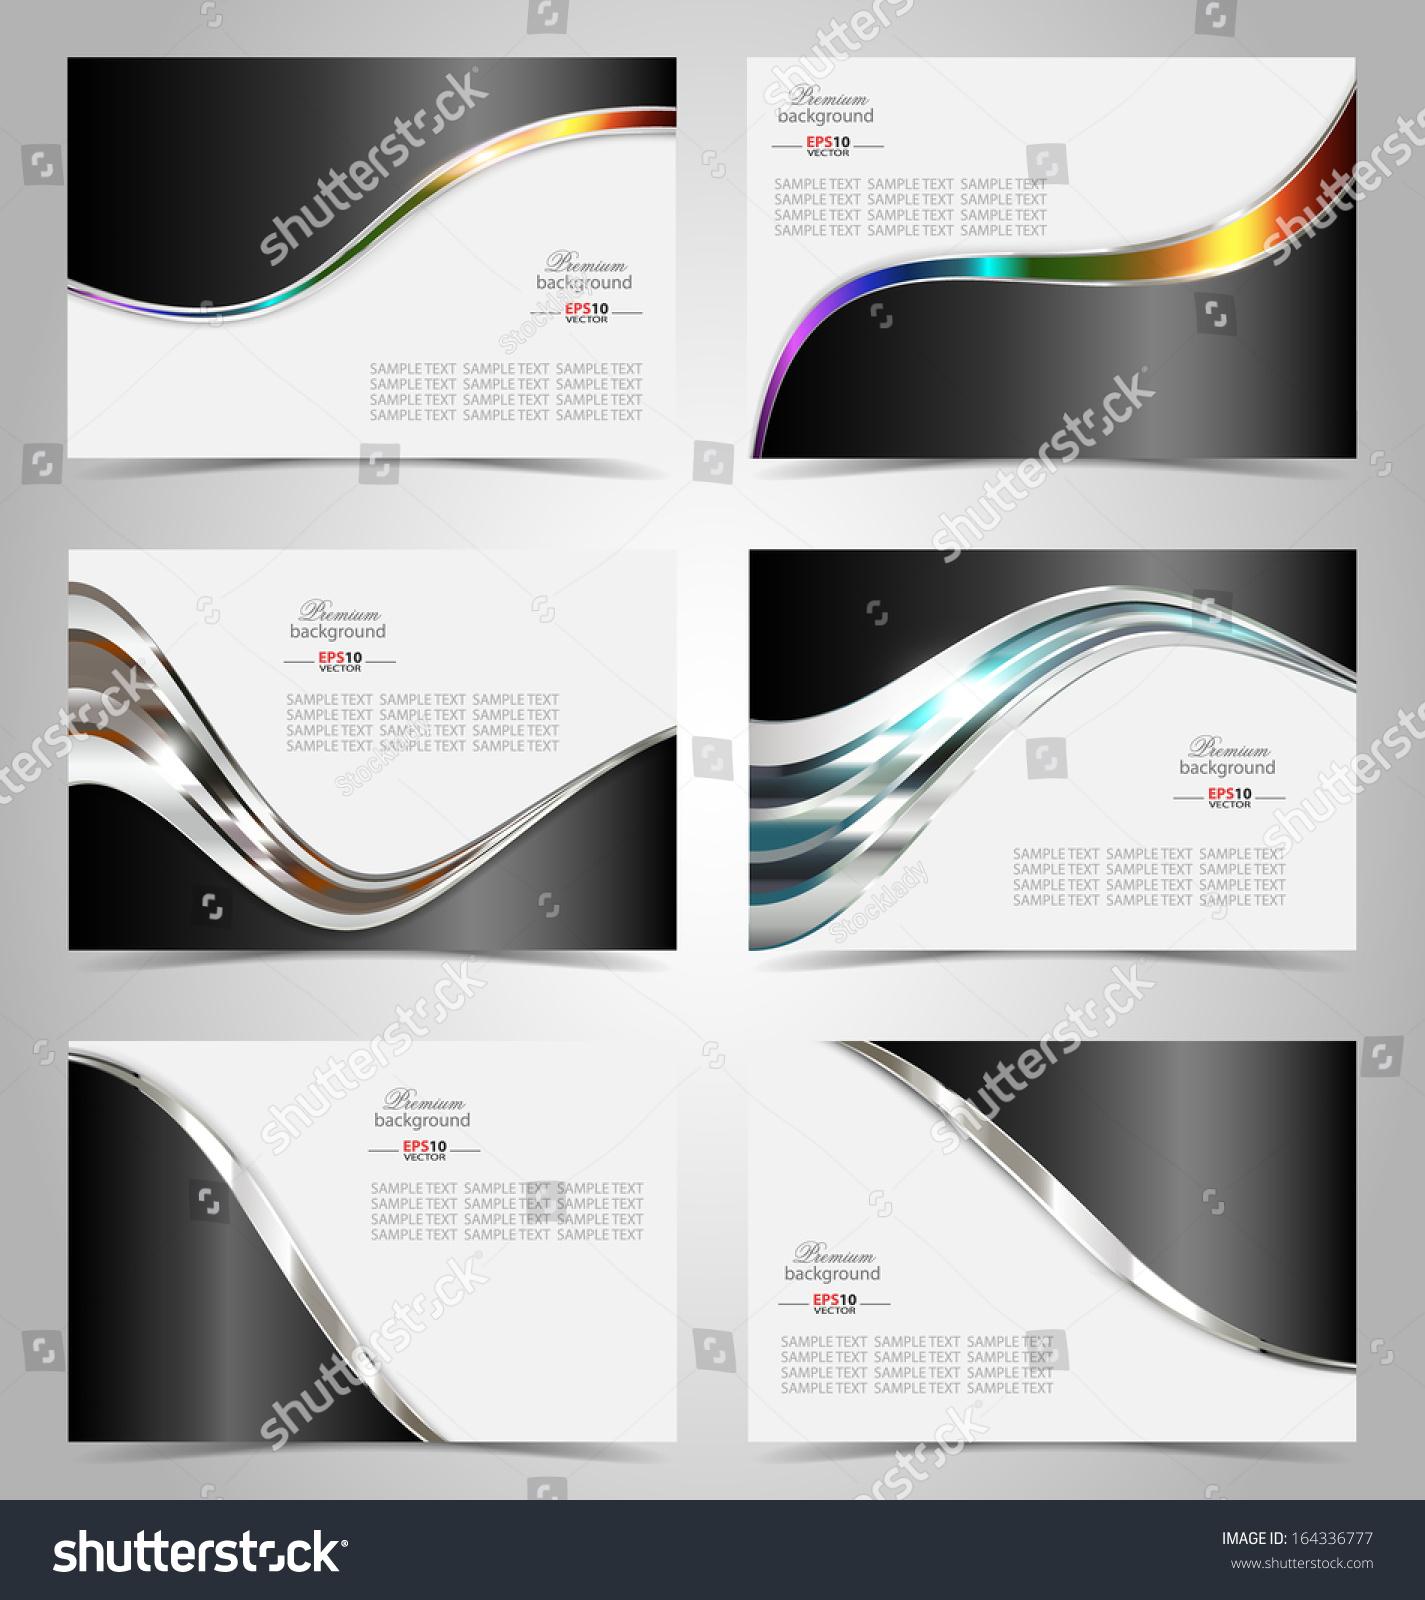 Elegant Business Card Design Template Creative Stock Vector ...